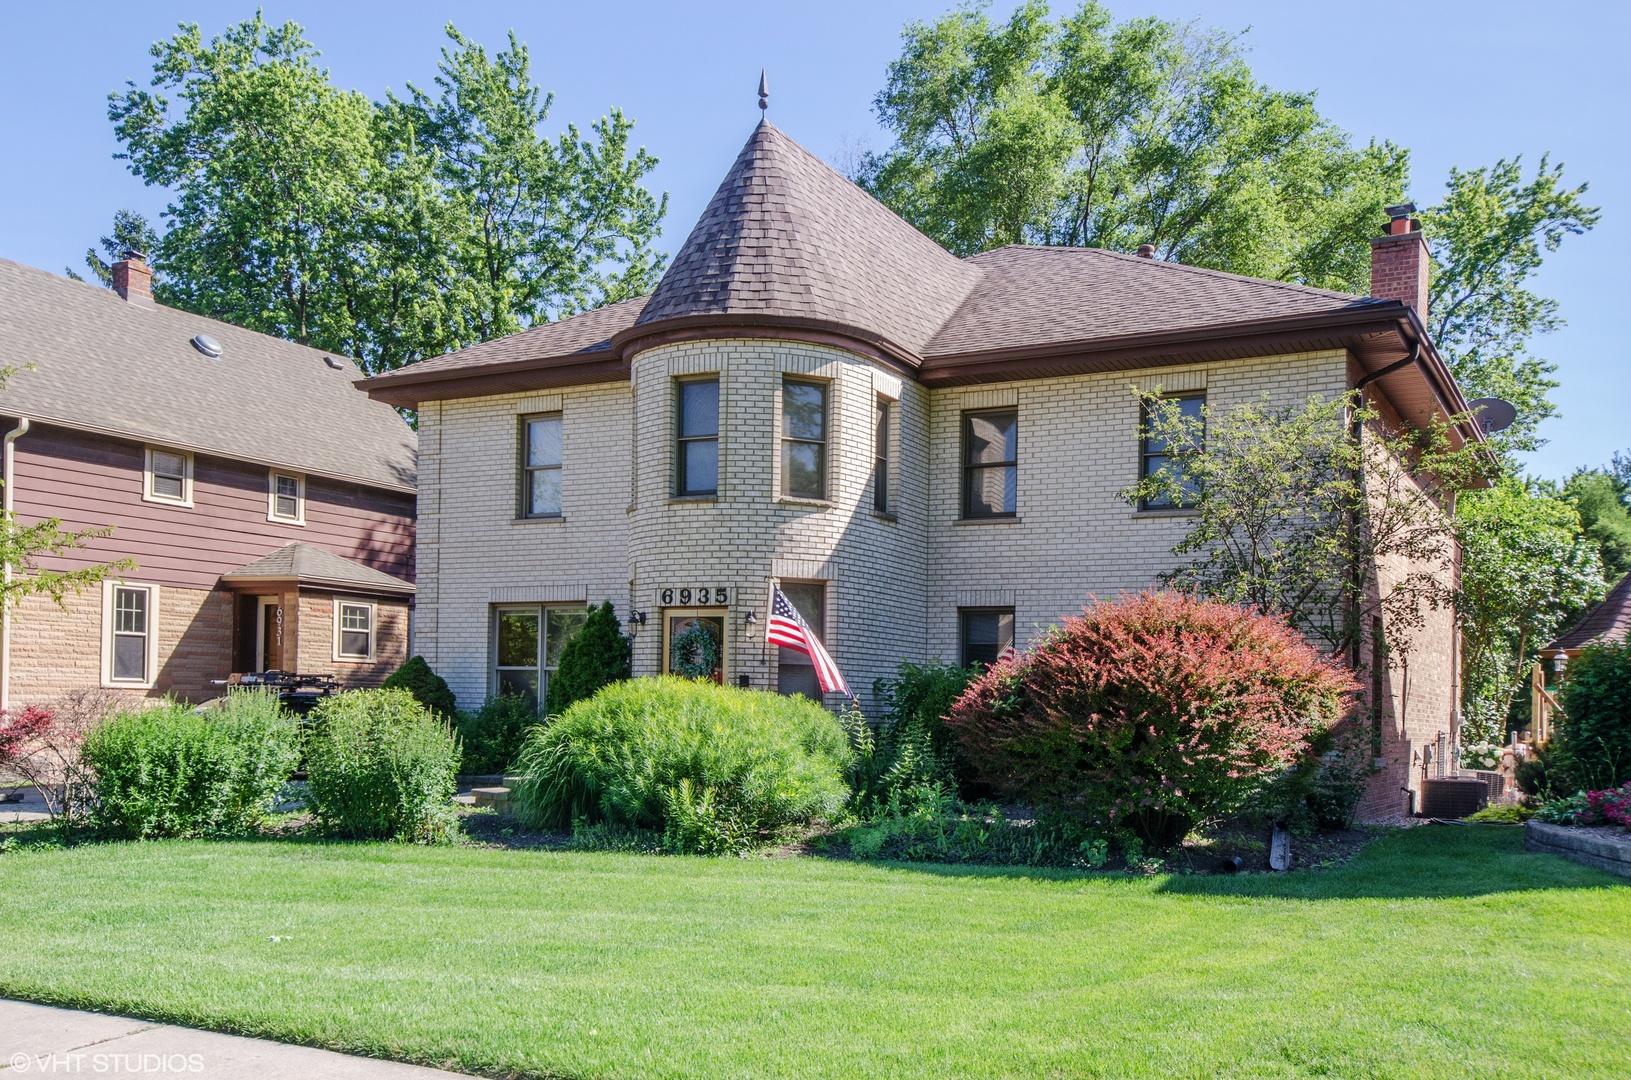 6935 West Hobart Avenue, Chicago-Edison Park, Illinois